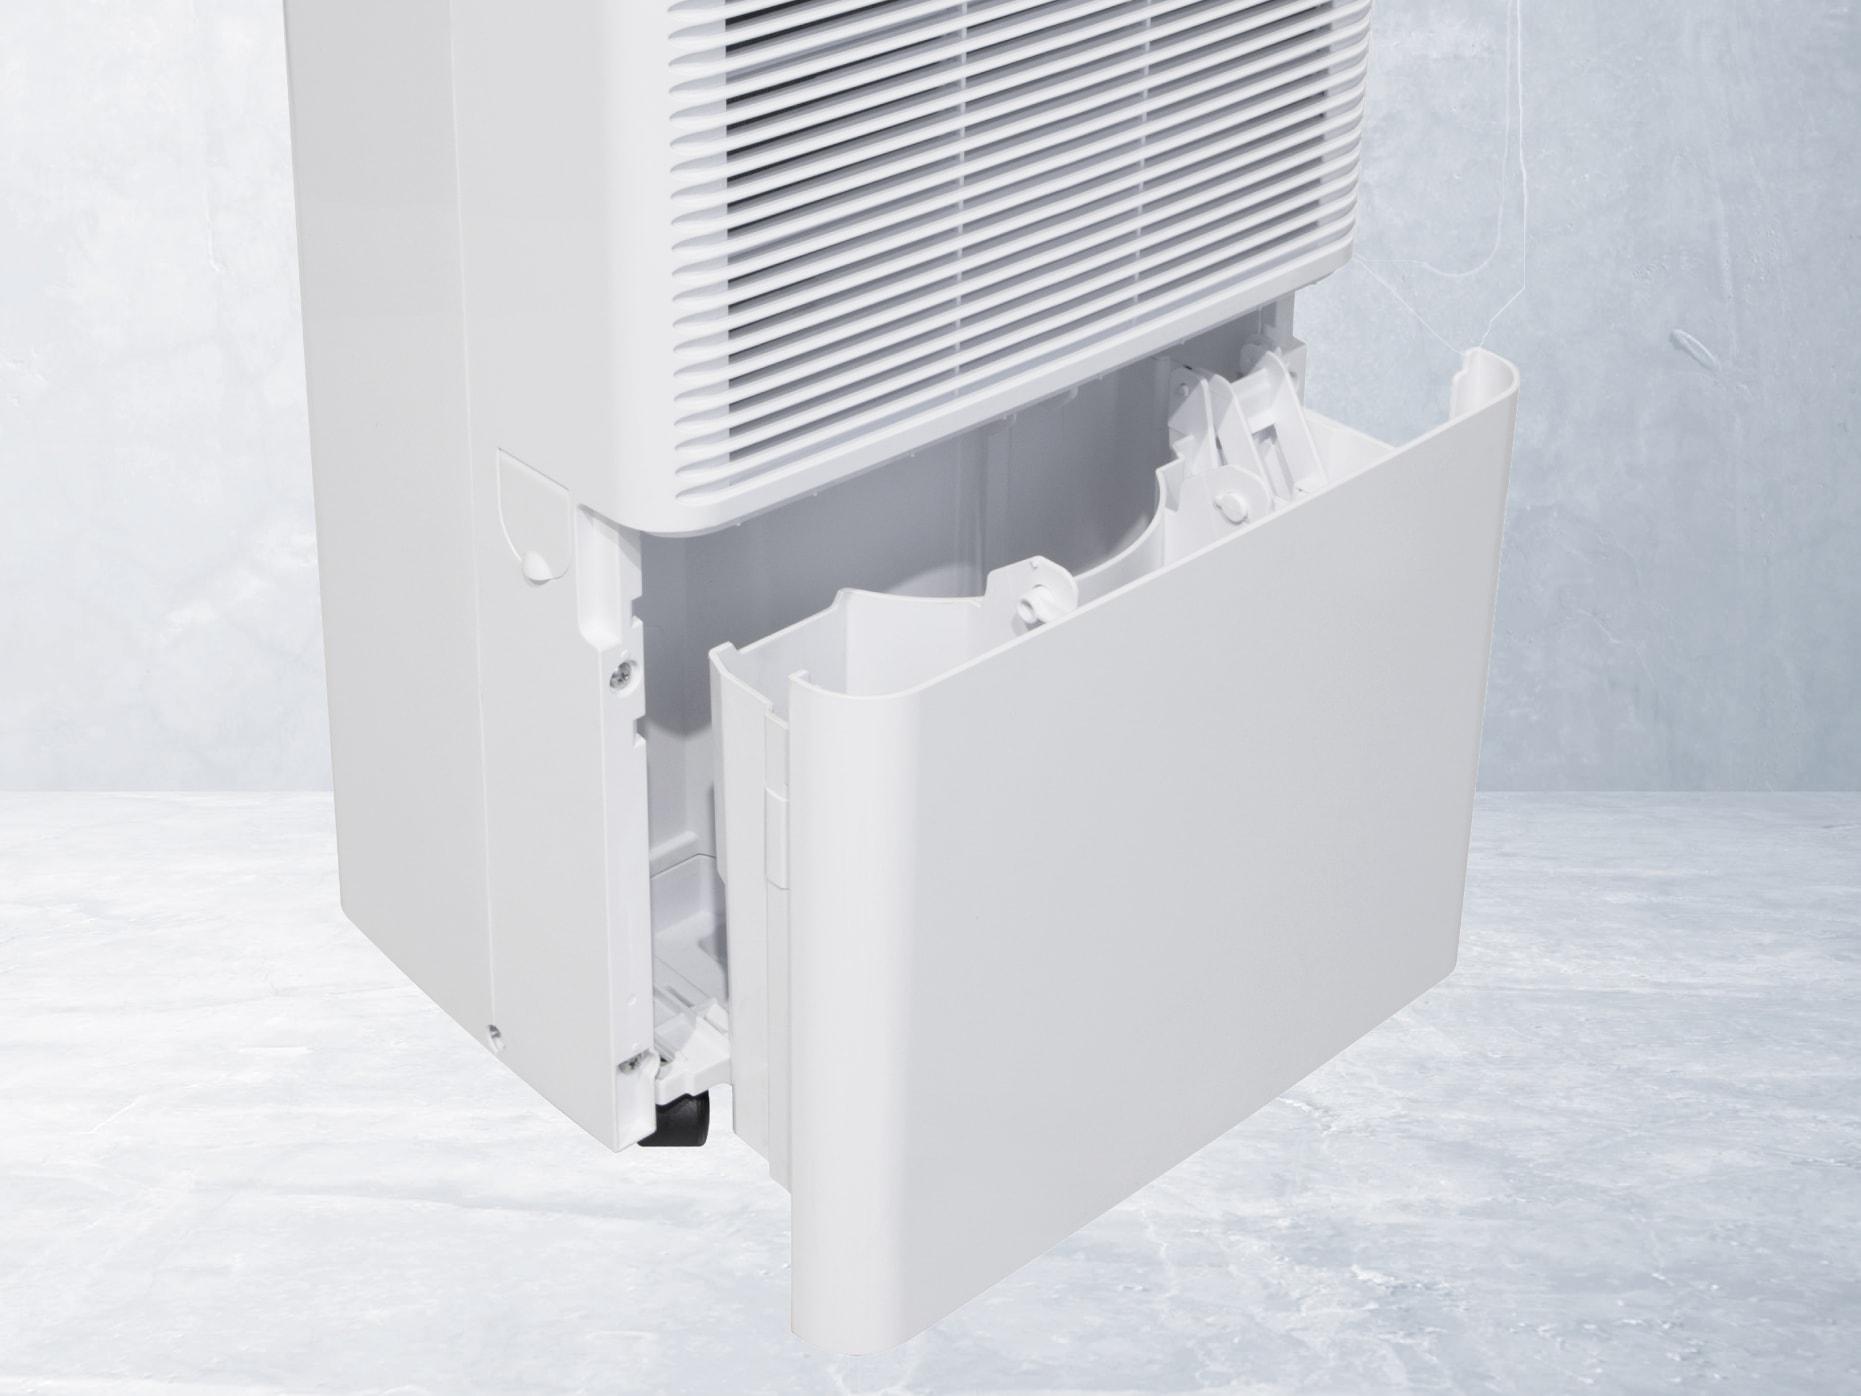 Cardbox - 3 Up Image